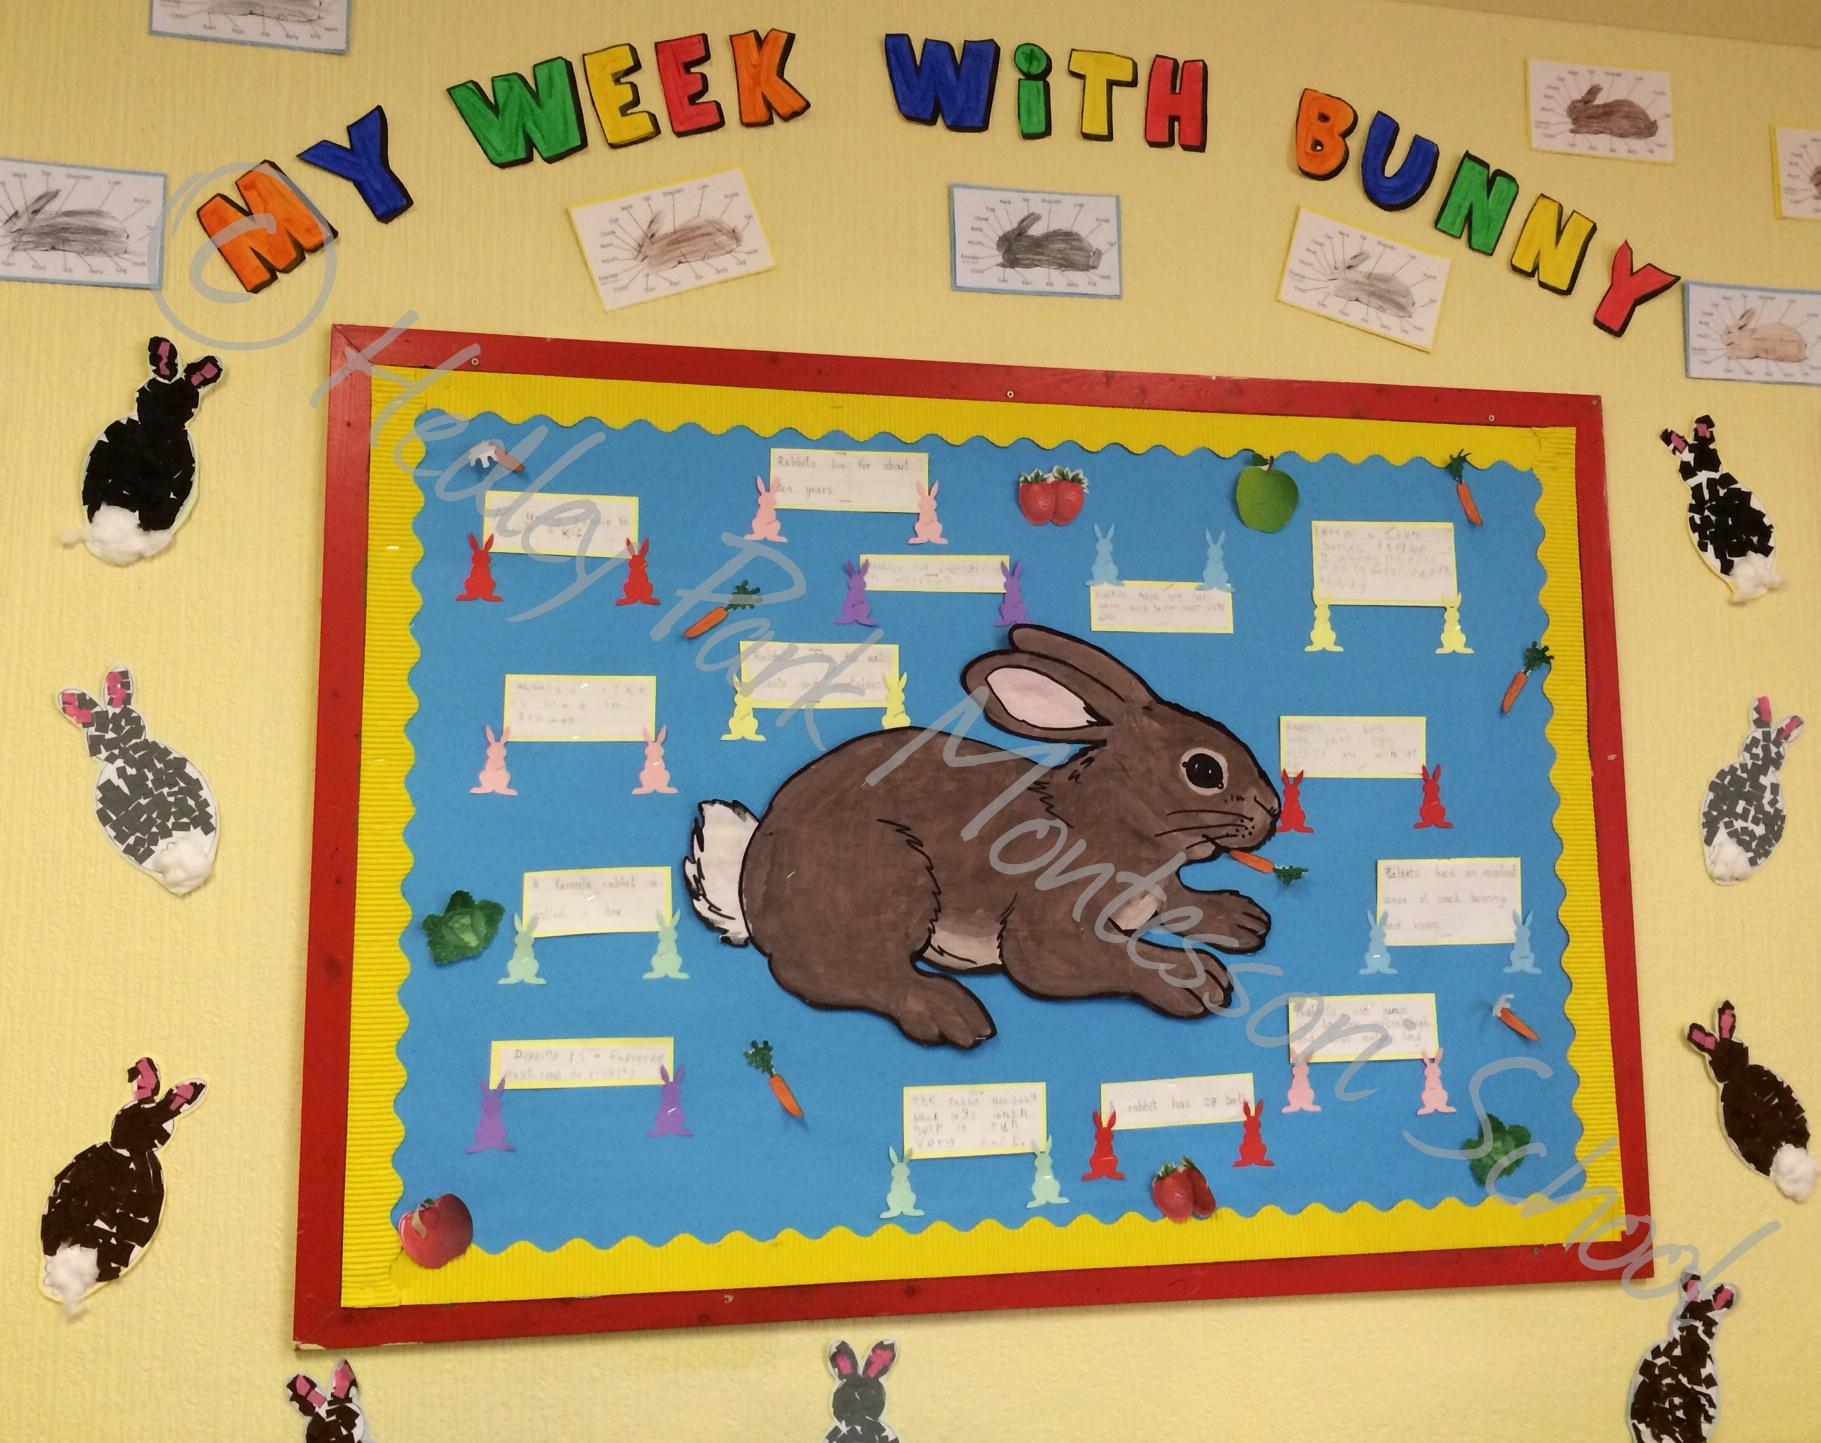 Junior Class My Week With Bunny Display